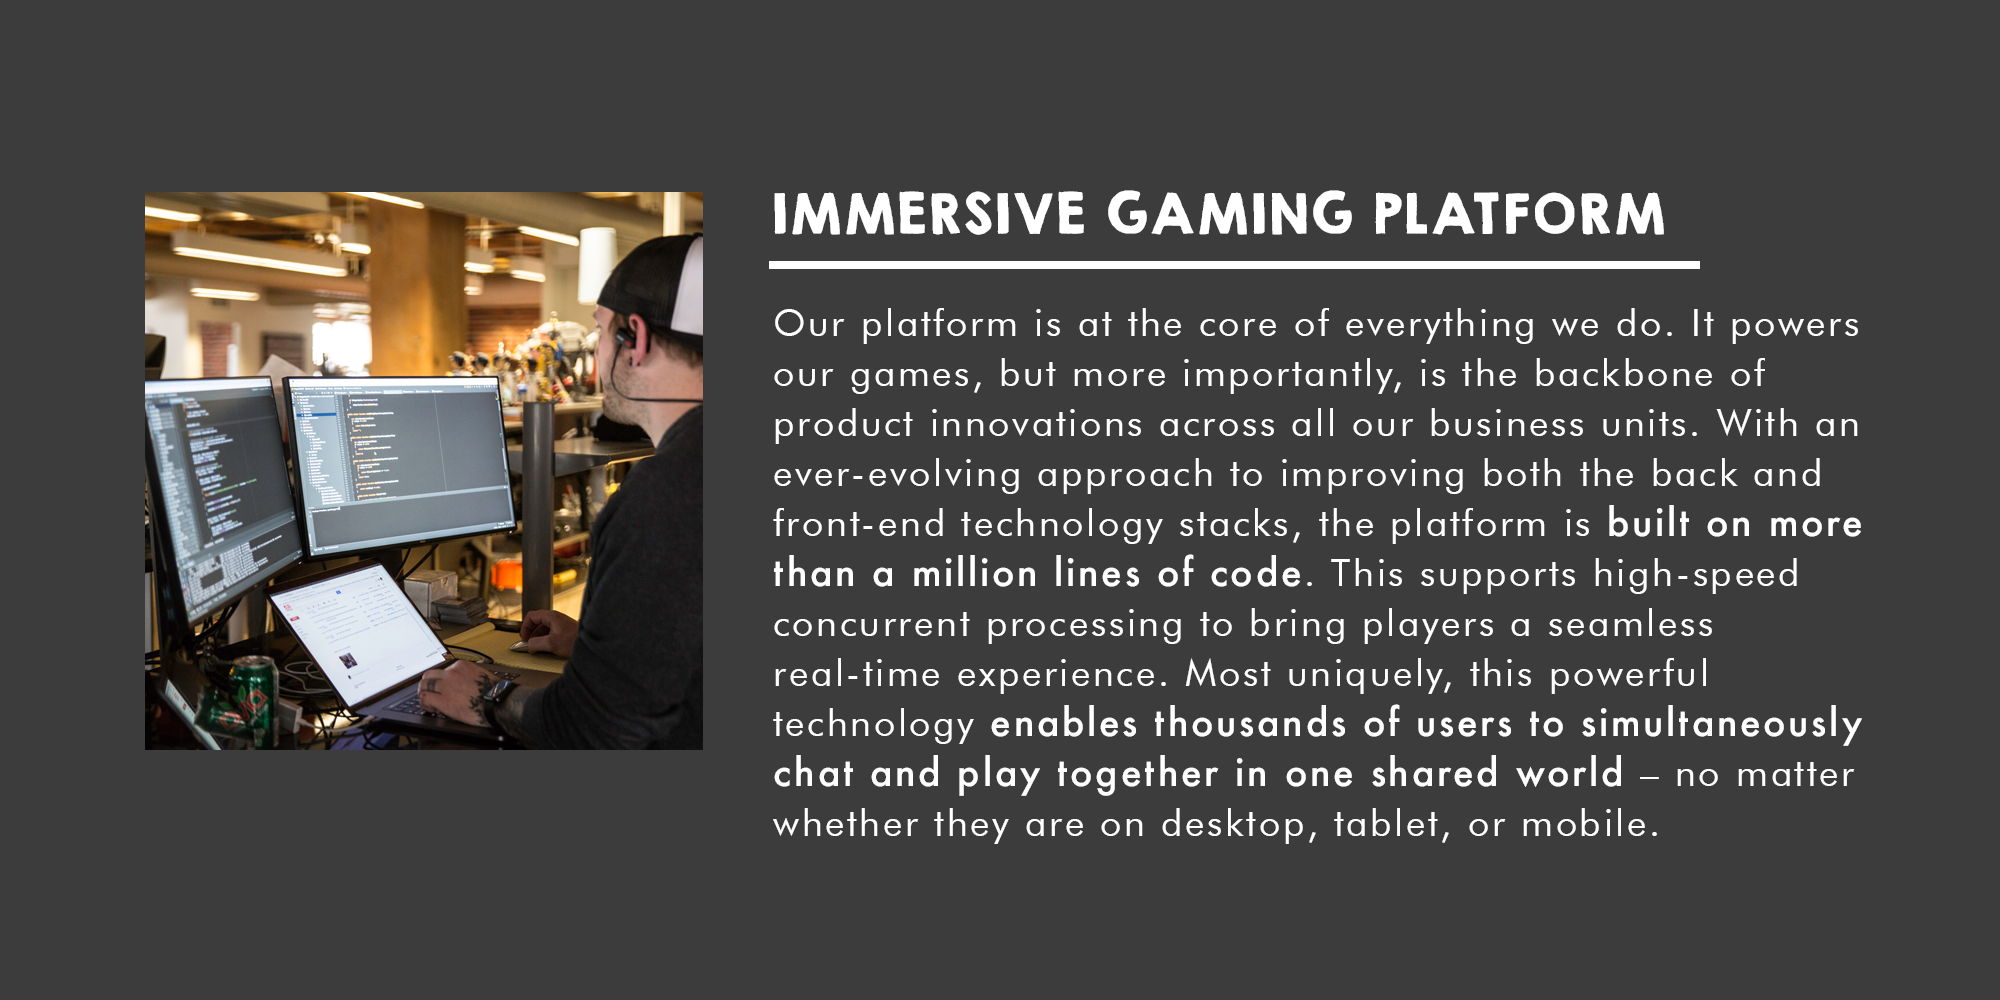 Immersive Gaming Platform